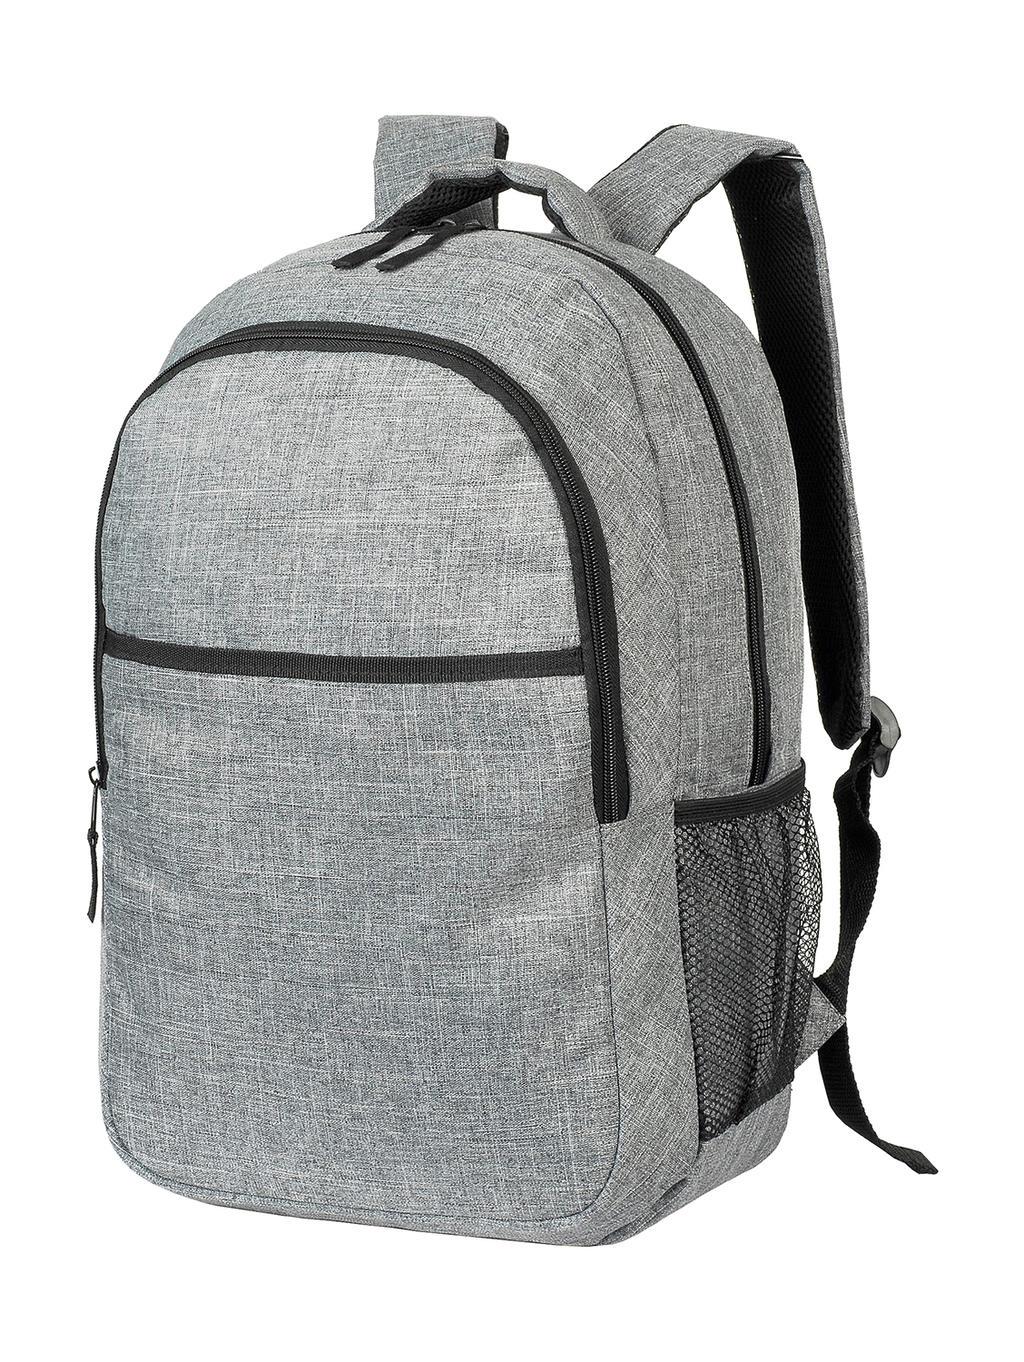 Bonn Students Laptop Bag